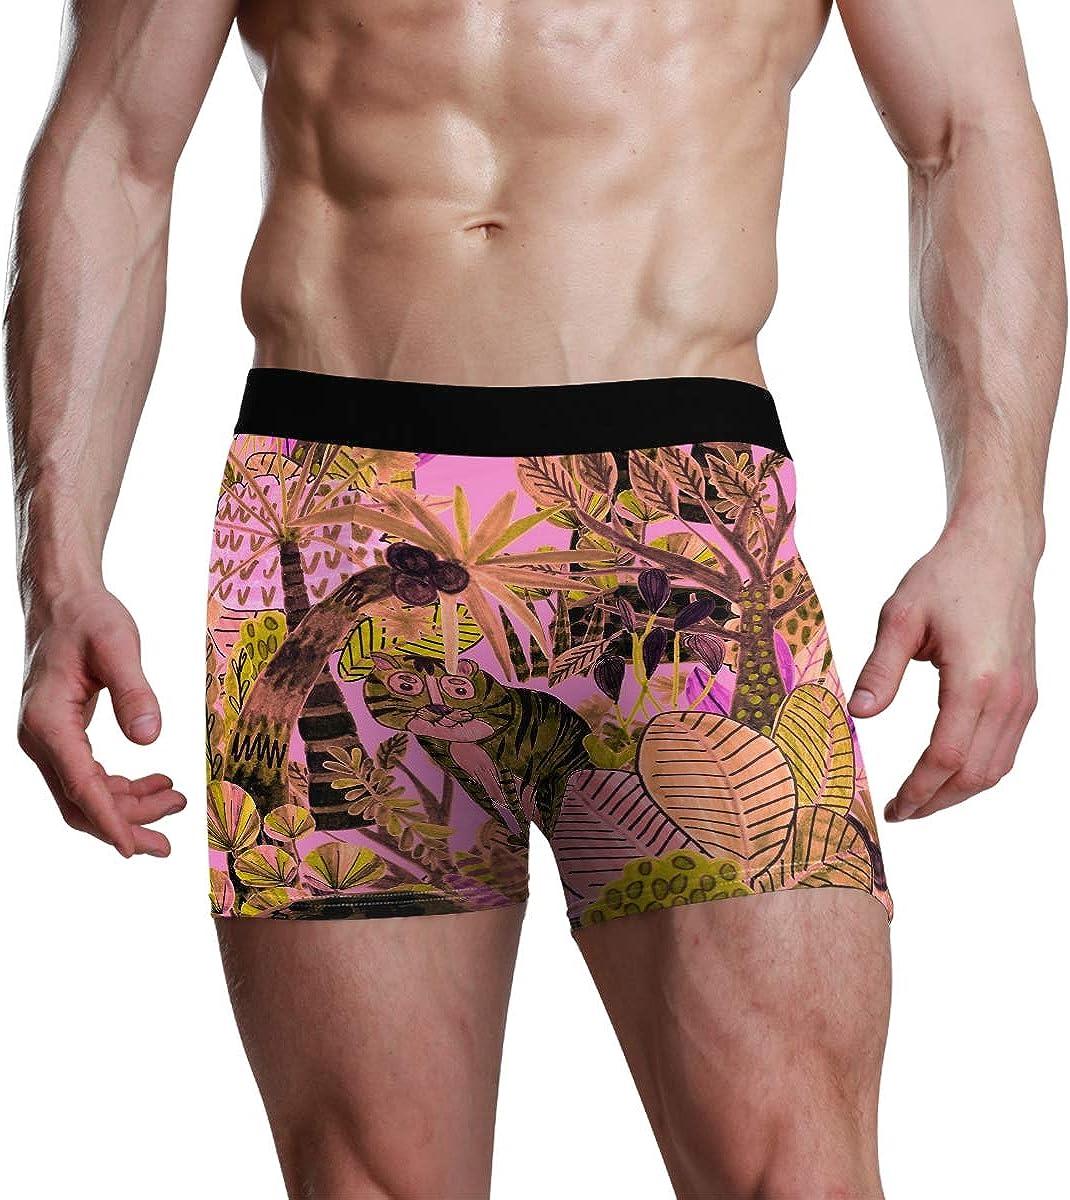 Mens Boxer Briefs Funny Animal Tiger Pink Coconut Tree Low Rise Trunks Underwear Breathable Bikini Boys